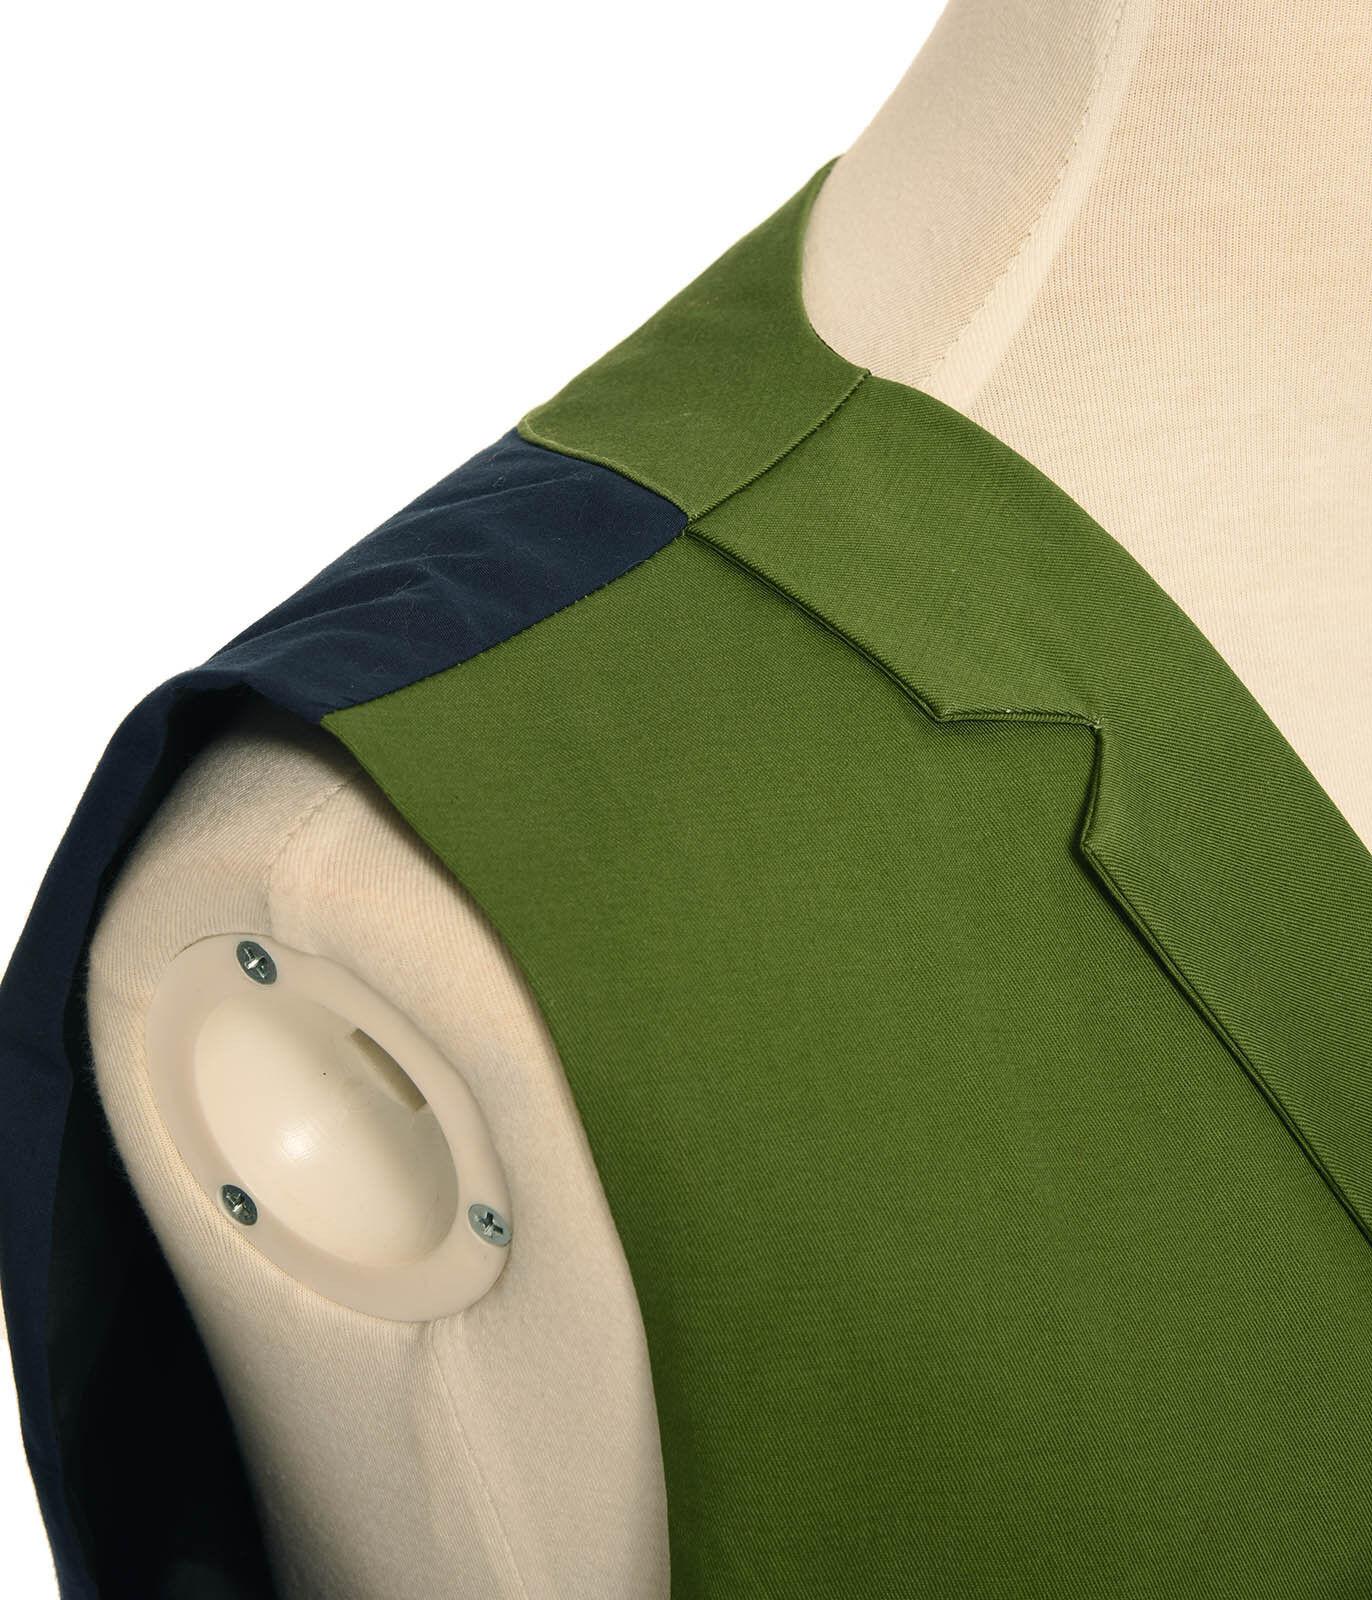 Vert Qualité Fête Costume Cosplay Batman Bonne Gilet Joker Hpw8qntBx